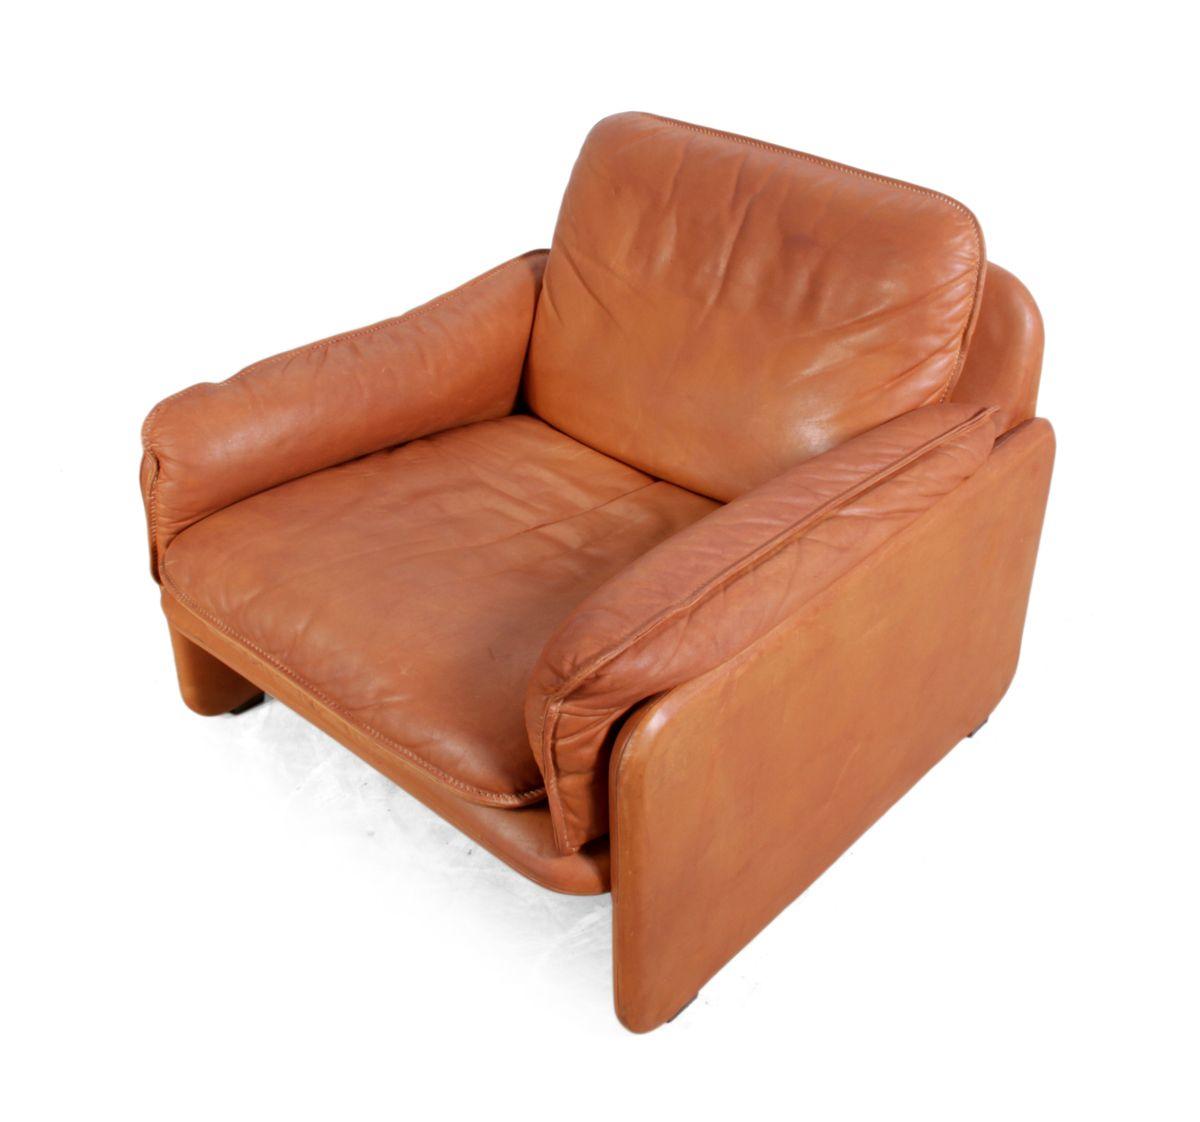 Vintage DS 61 Leather Armchair By De Sede 1980s For Sale